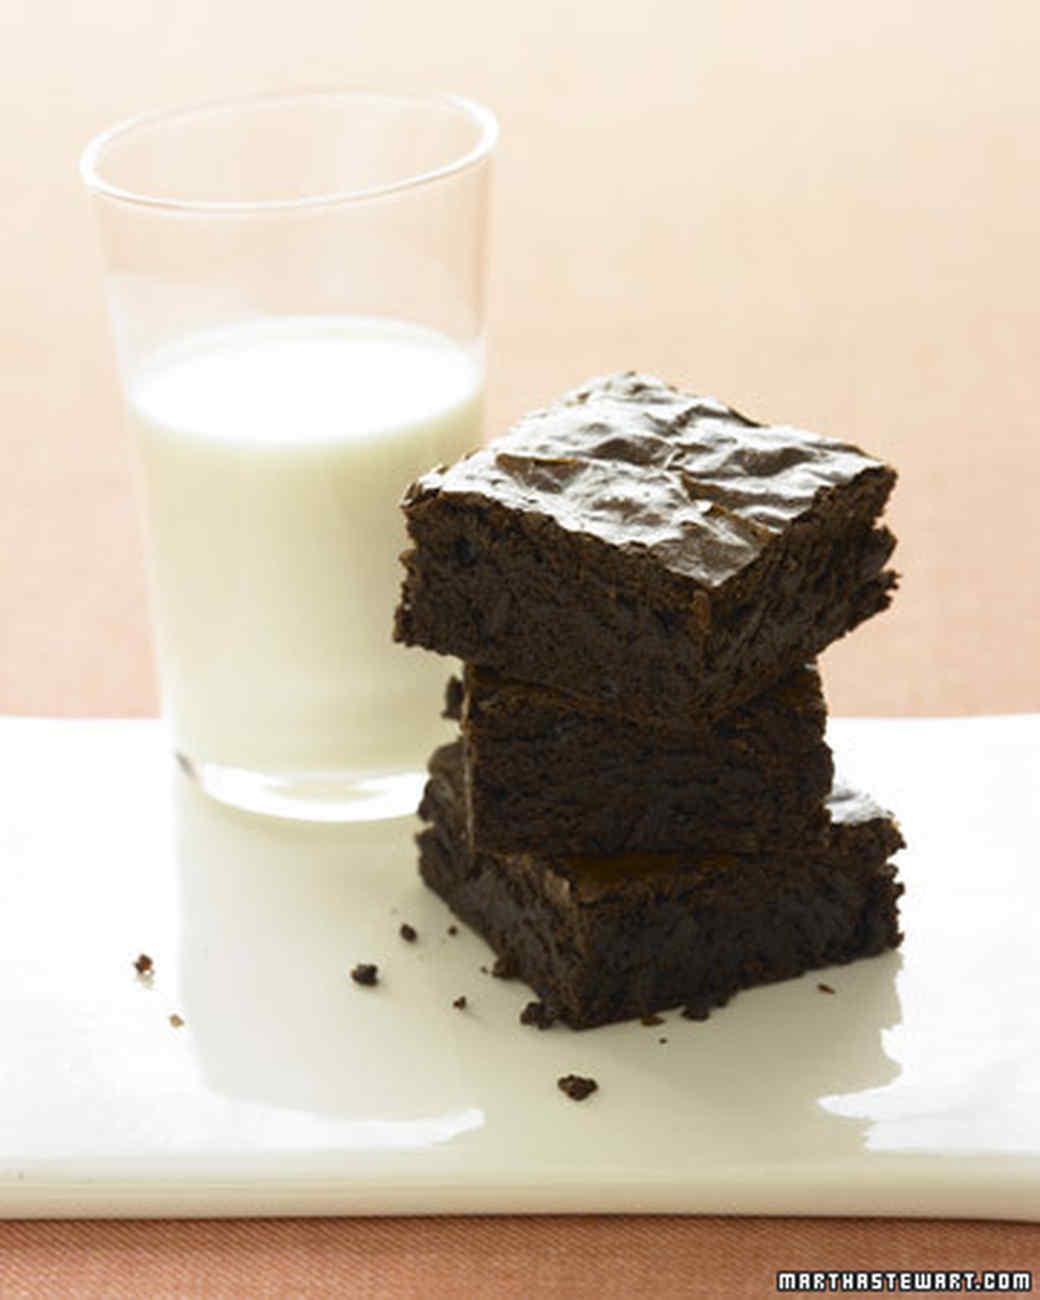 msl_sept06_dessert_brownies.jpg